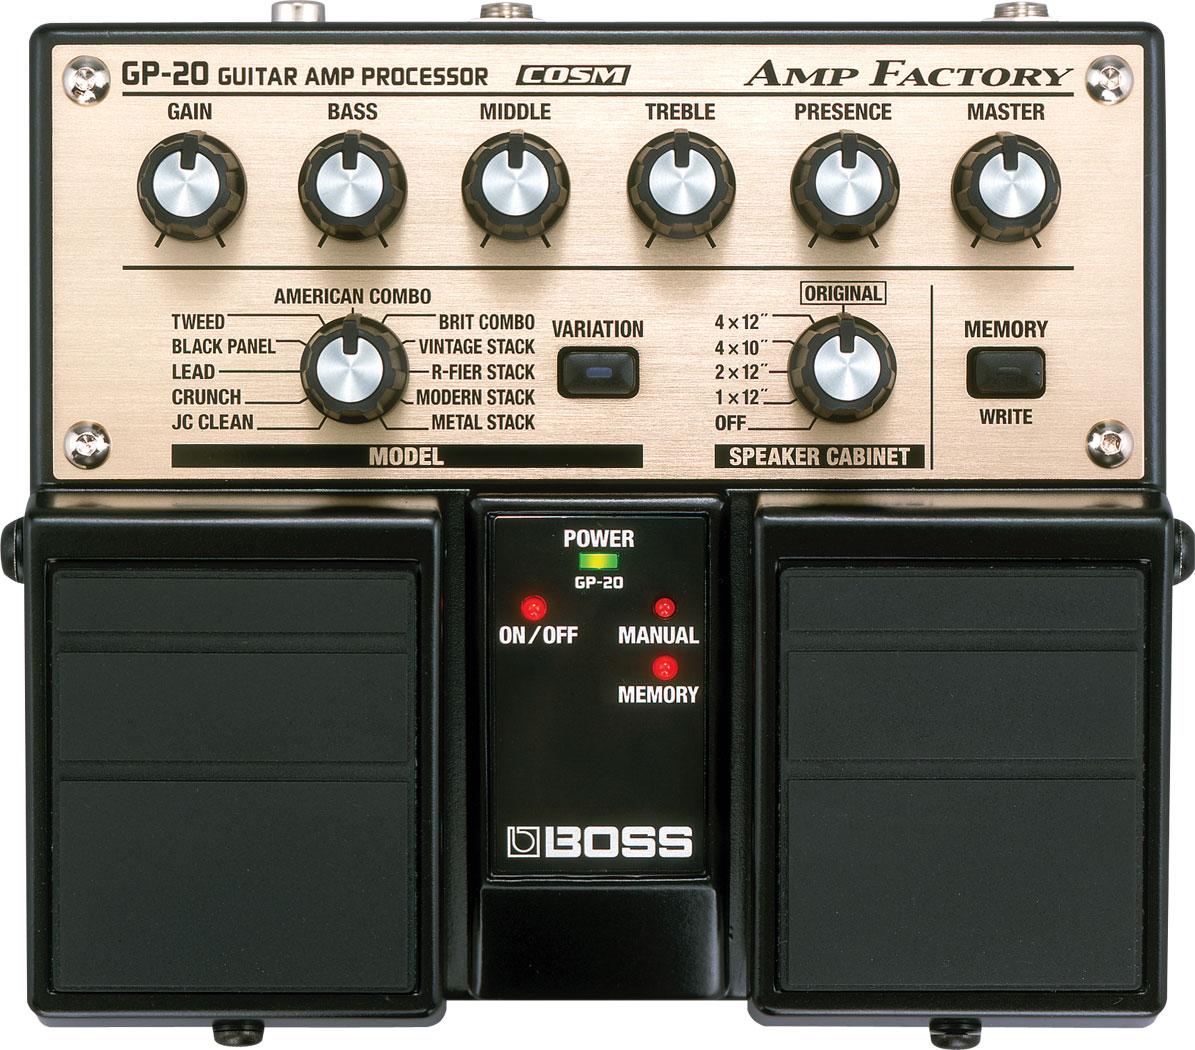 boss gp 20 amp factory. Black Bedroom Furniture Sets. Home Design Ideas